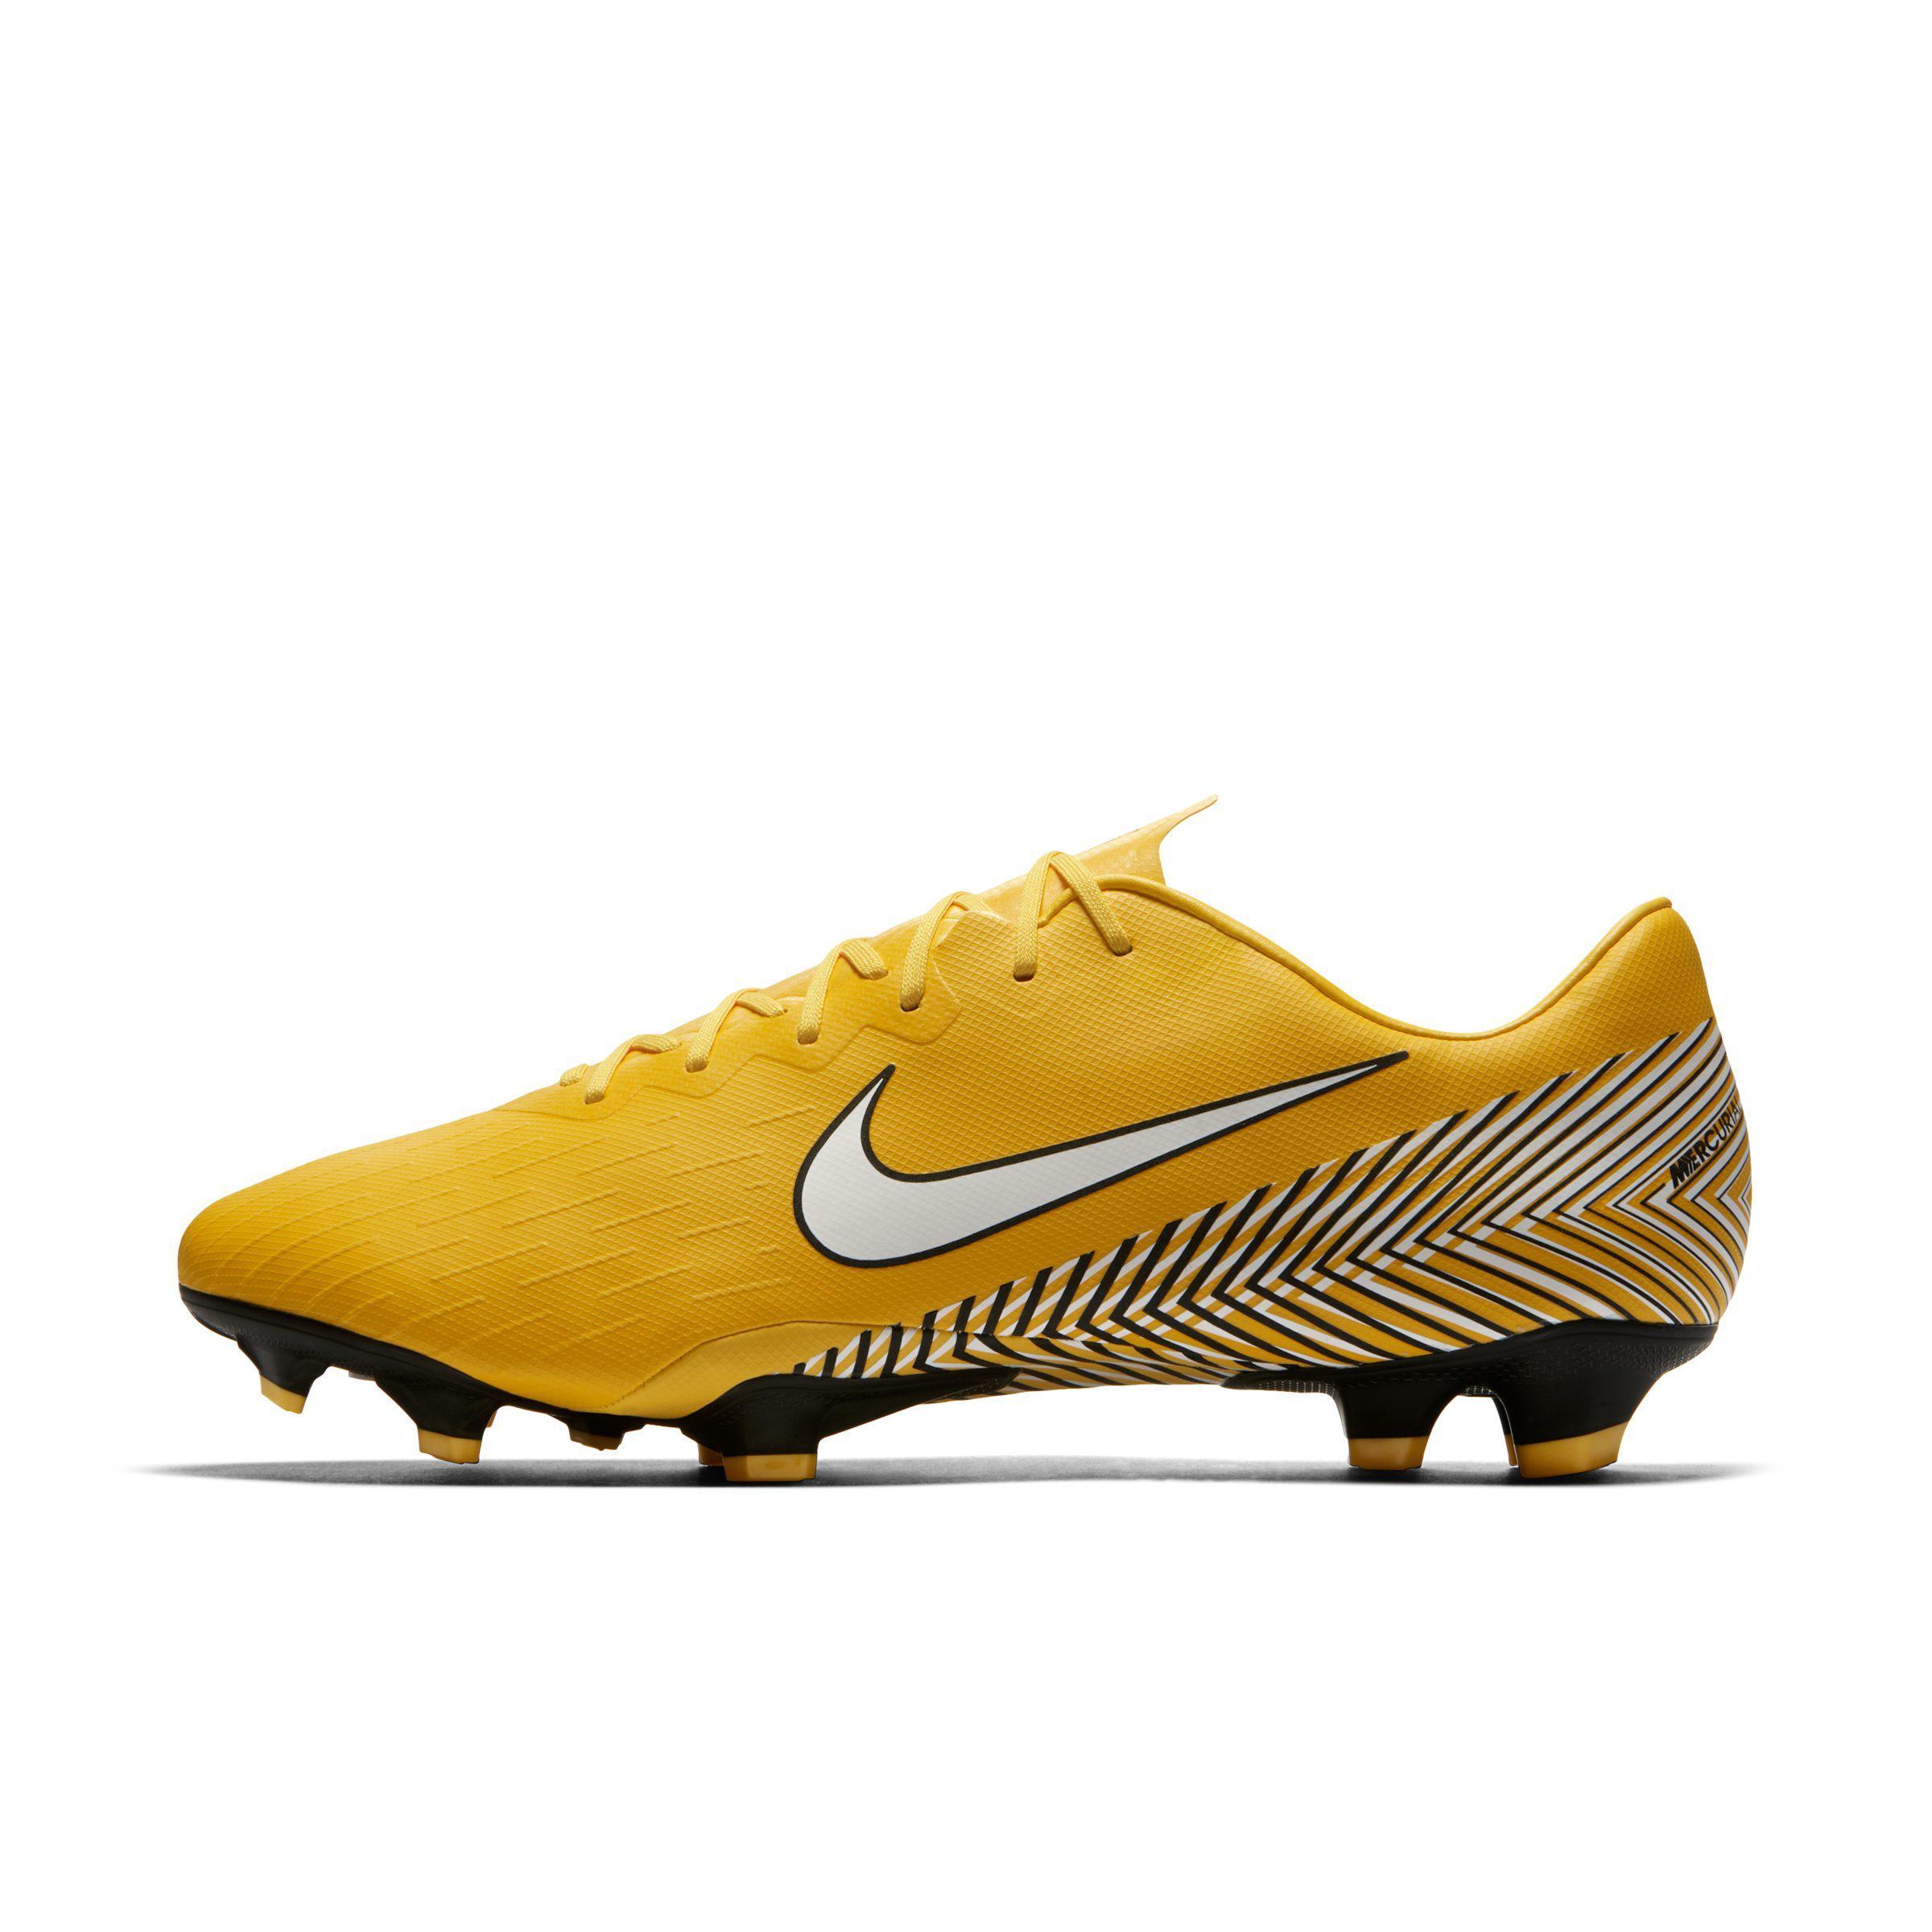 16e0047c293 Nike Mercurial Vapor Xii Pro Neymar Jr. Firm-ground Football Boot in ...